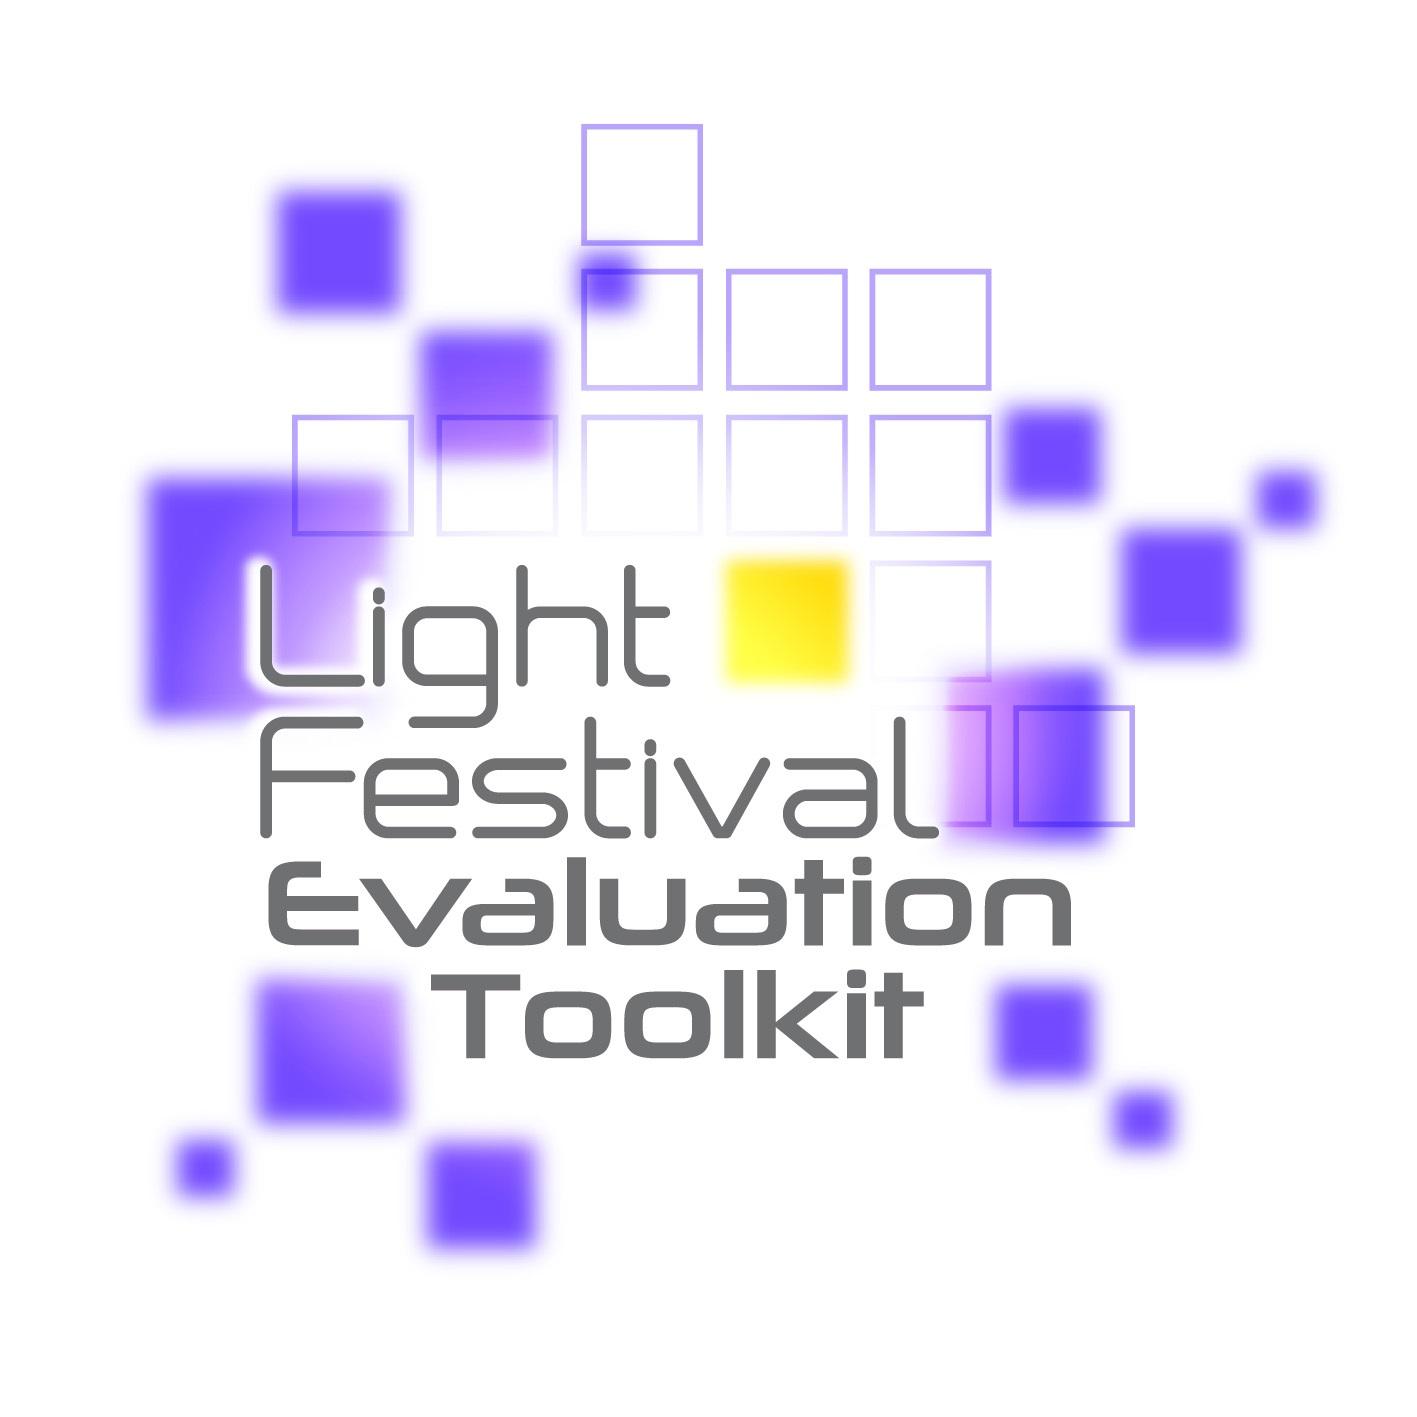 toolkit-festival